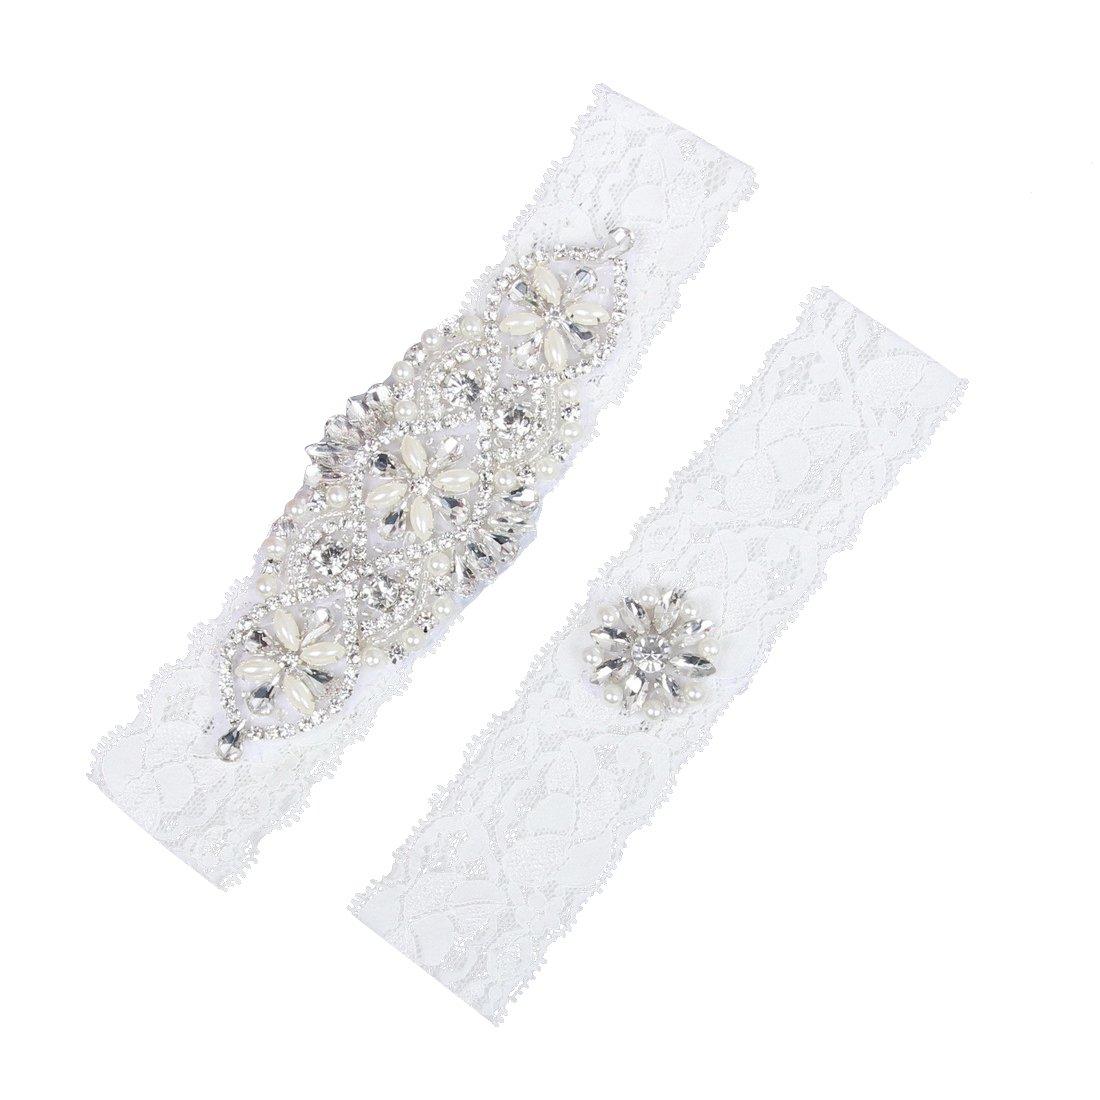 Prettybabyonline Wedding Garters Bride Bridal Garters Set Belt Lace Pearls Plus Size